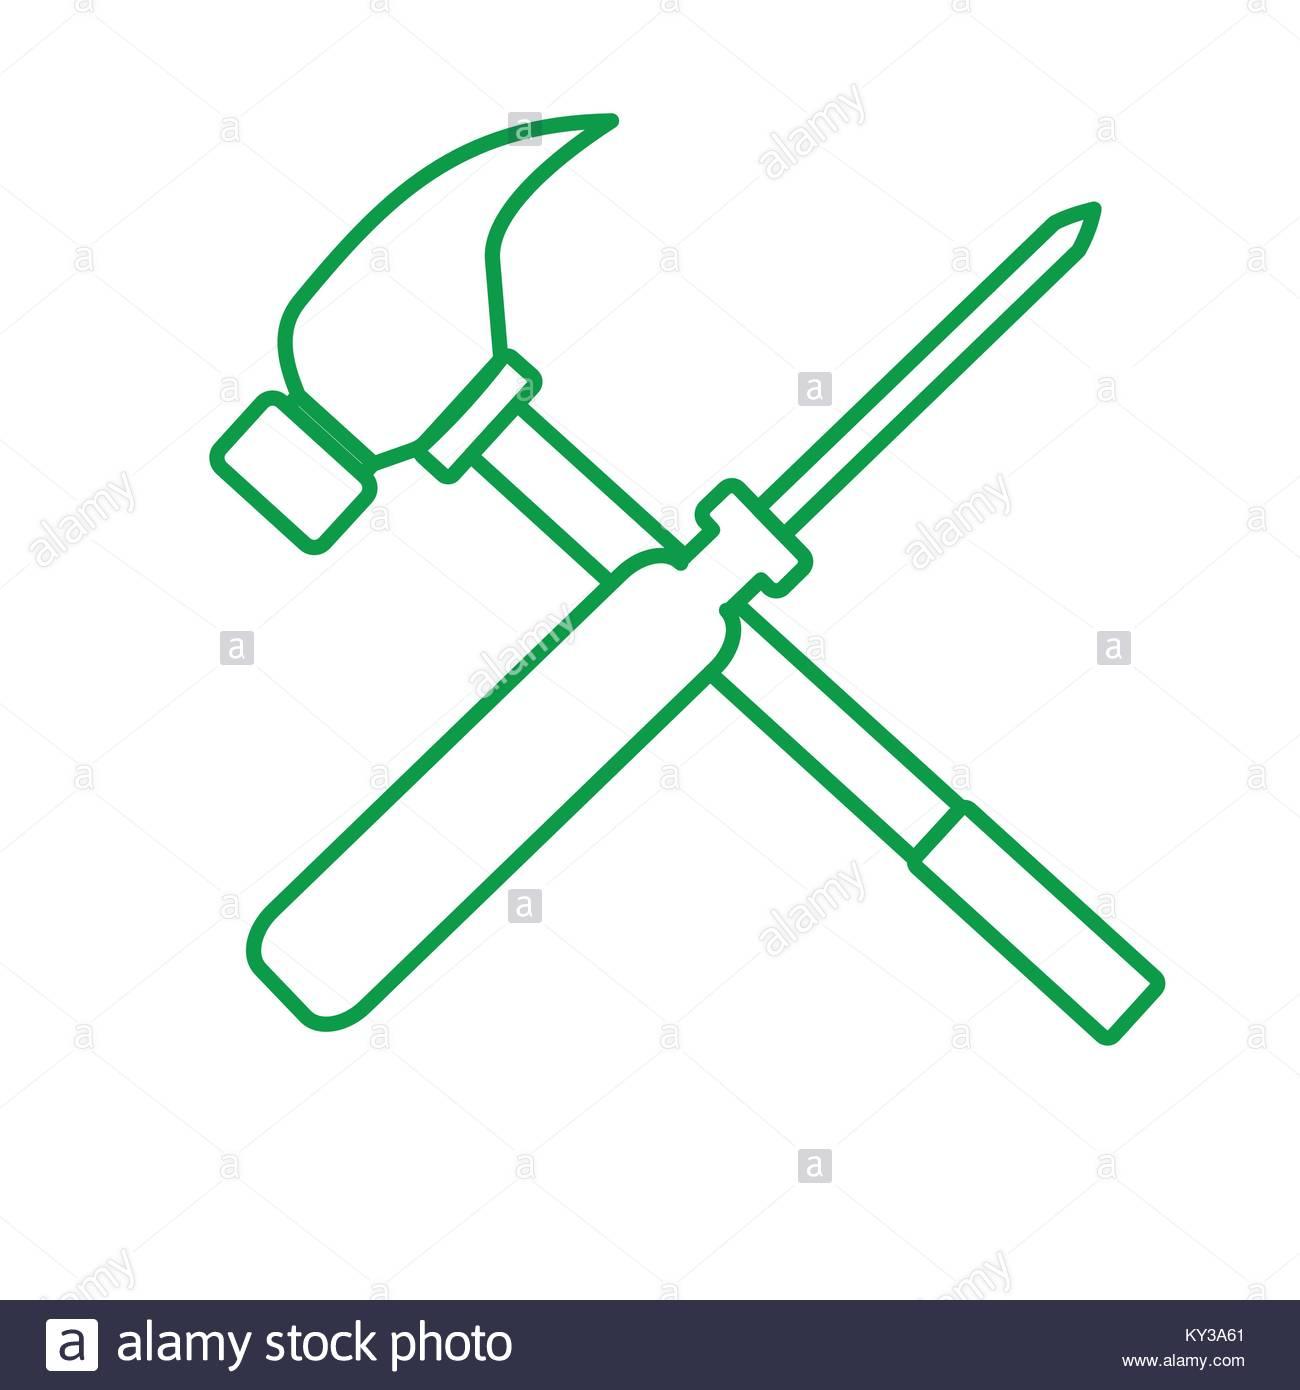 1300x1390 Outline Screwdriver Hammer Cross Drawing Vector Illustration